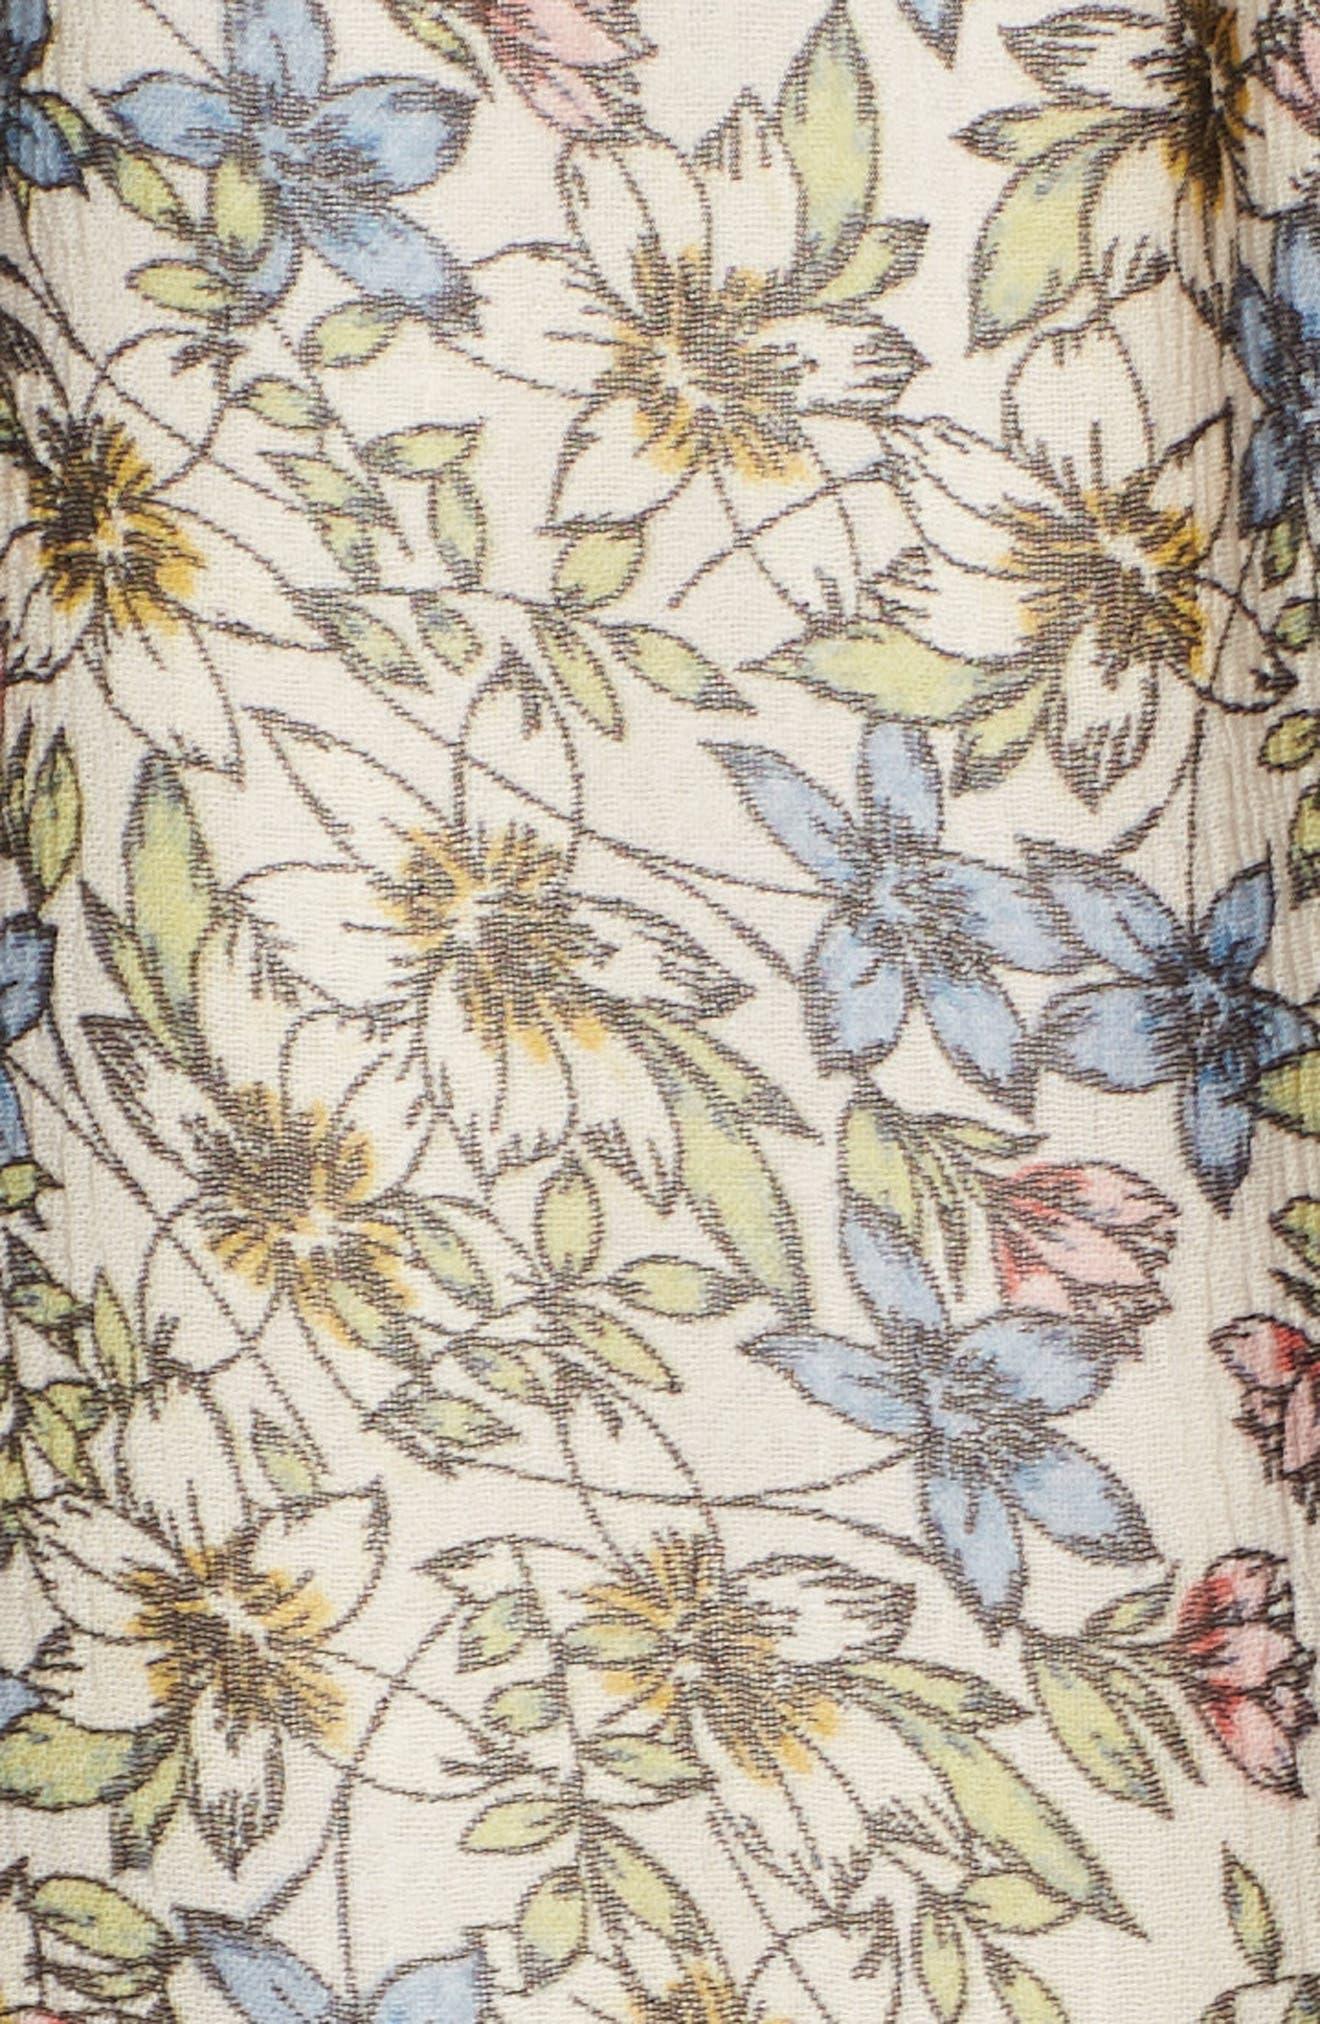 Deda Popover Dress,                             Alternate thumbnail 5, color,                             Oatmeal